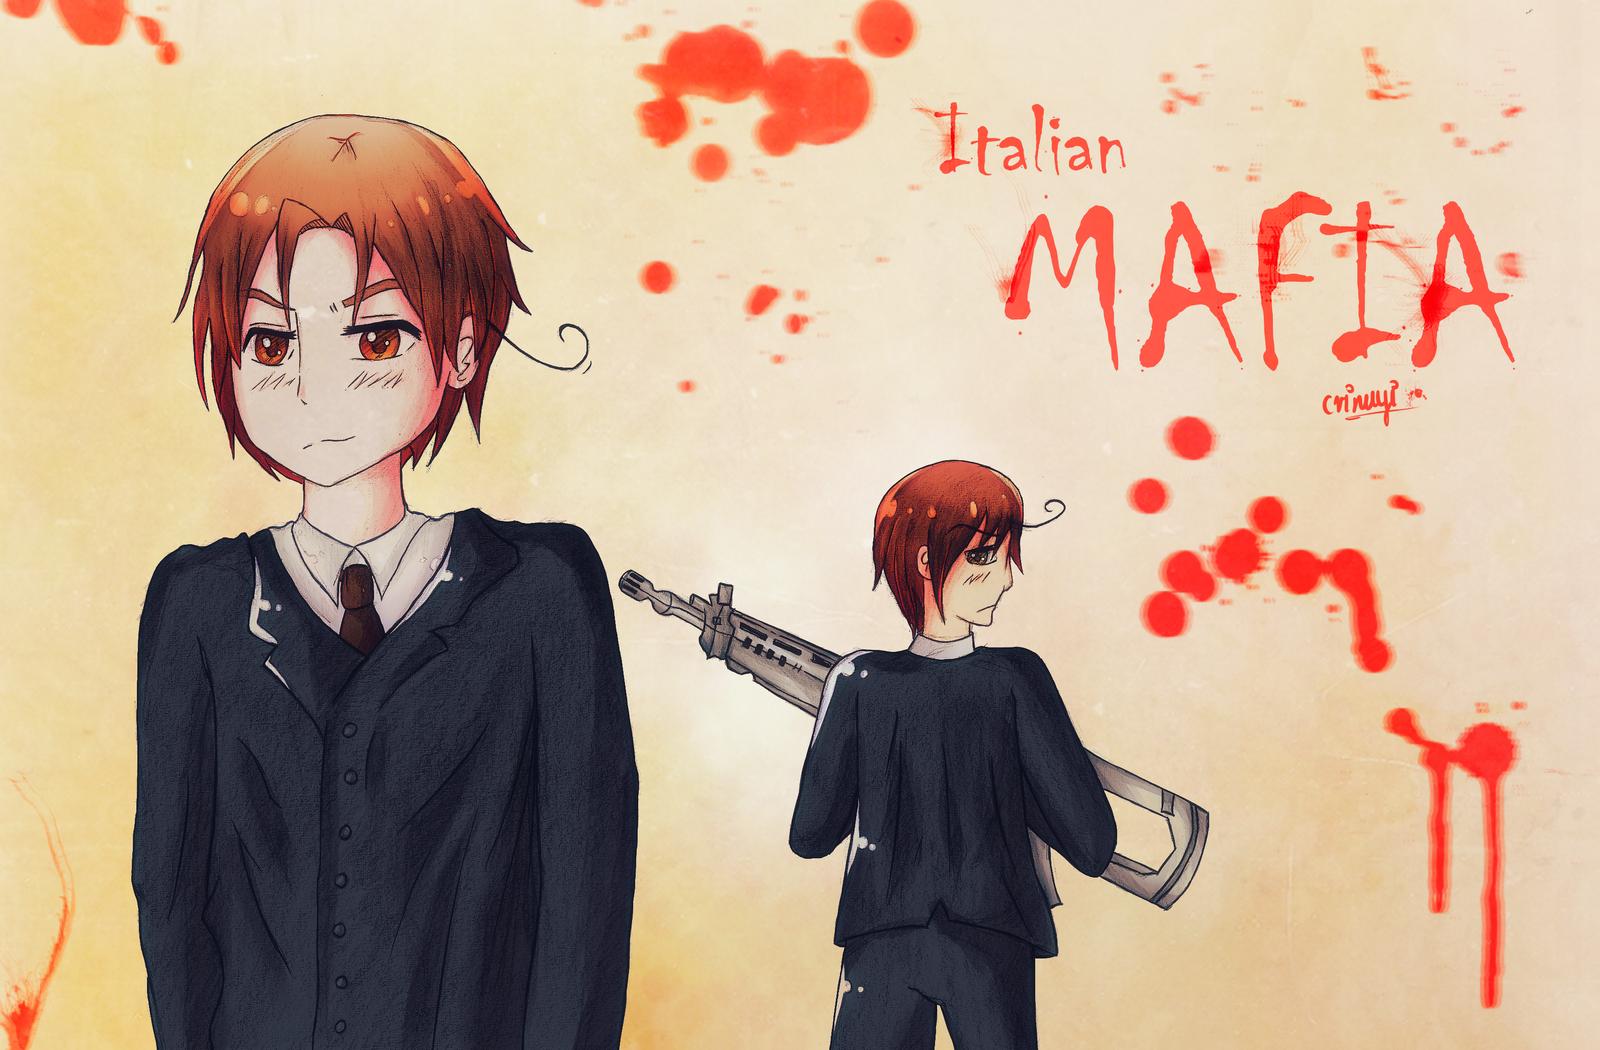 Italian Mafia by crinuyi